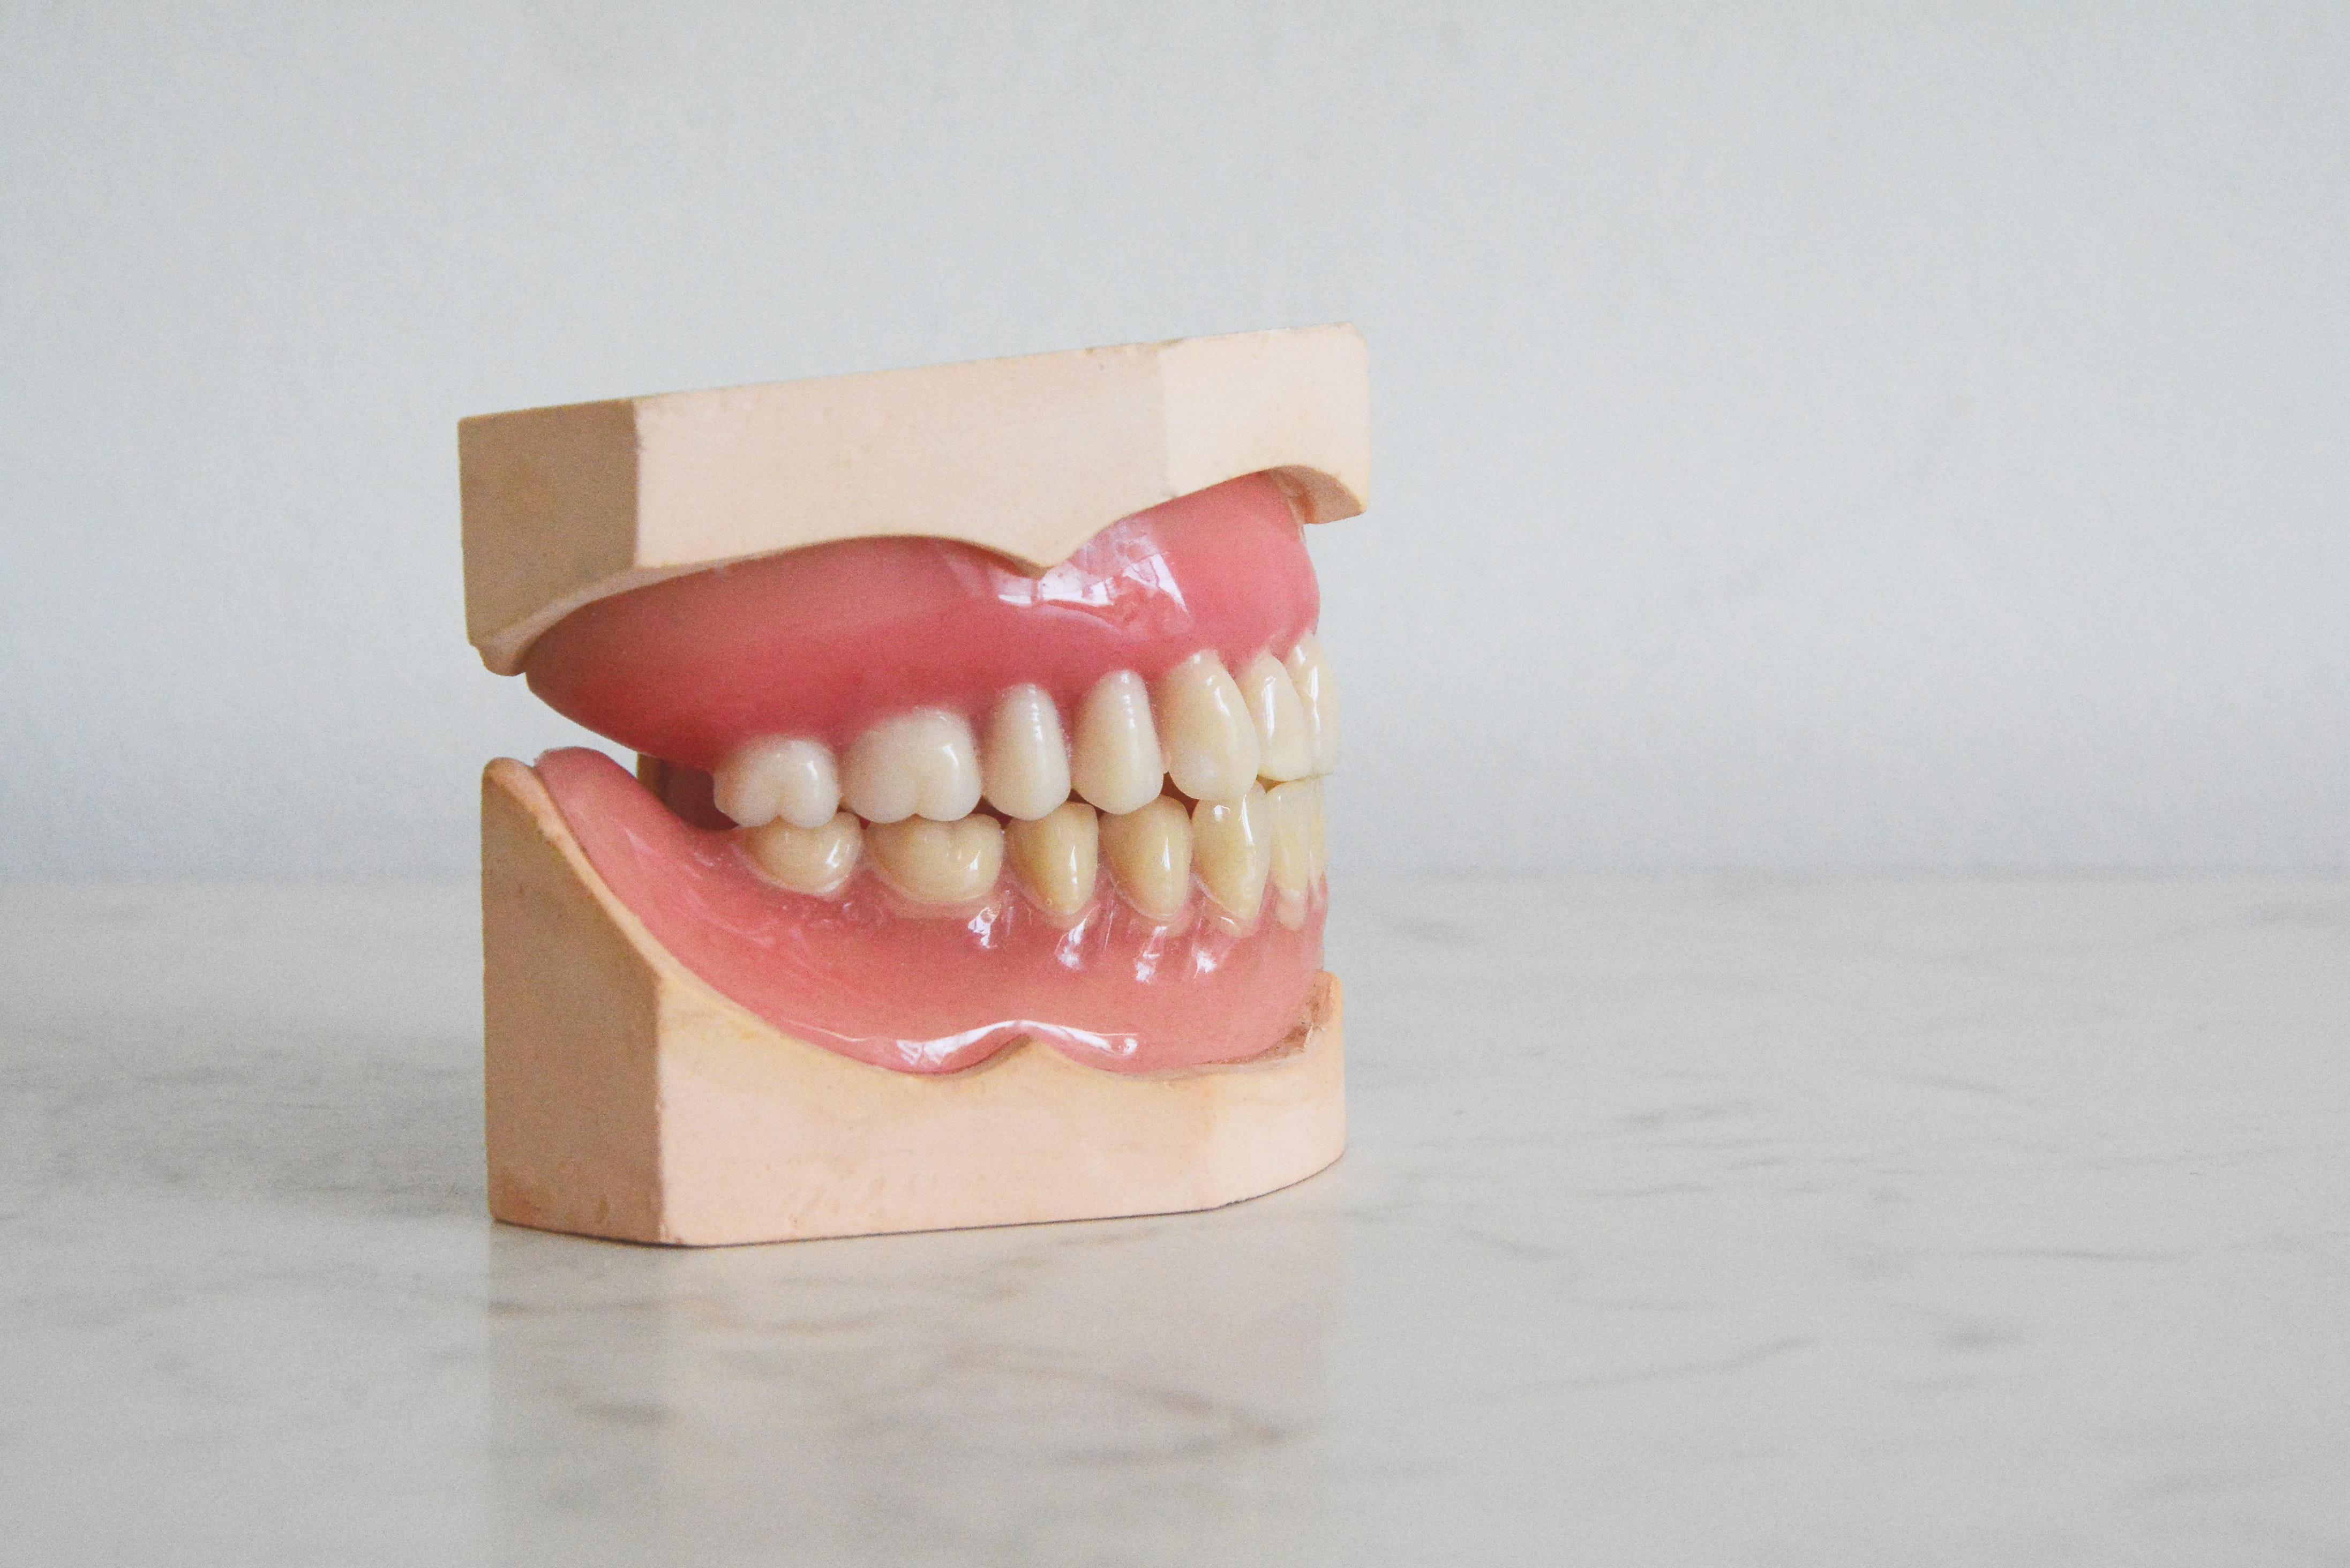 set-of-practice-teeth-for-dental-hygienist